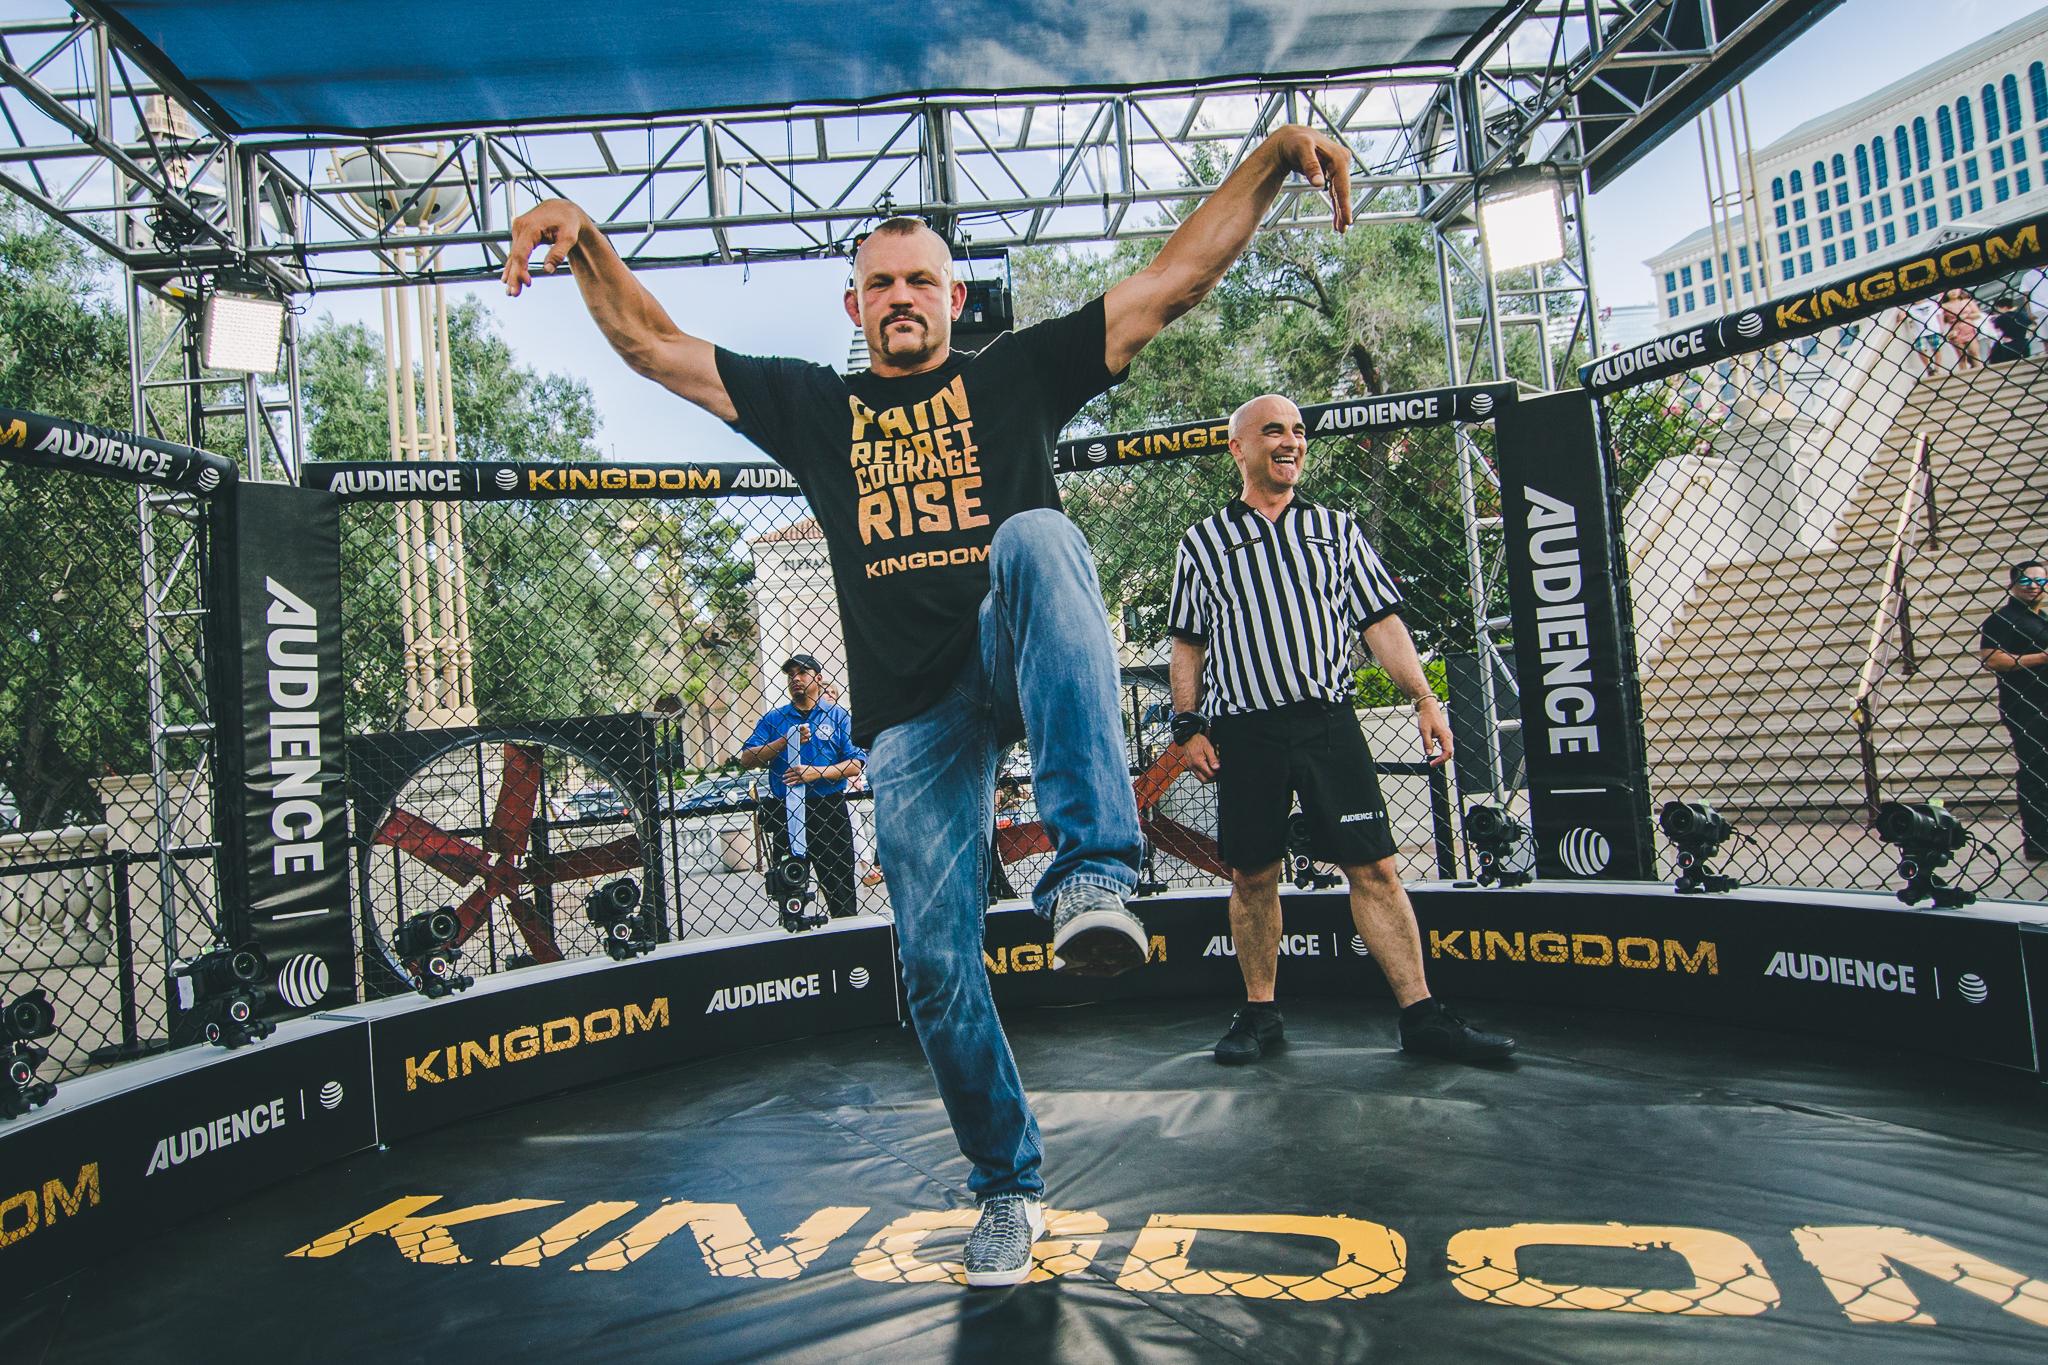 NCompass_Kingdom-Directv-UFC_Vegas_20160708_Kingdom-NCompass_14_July 08- 2016_9A7A9303_169.jpg